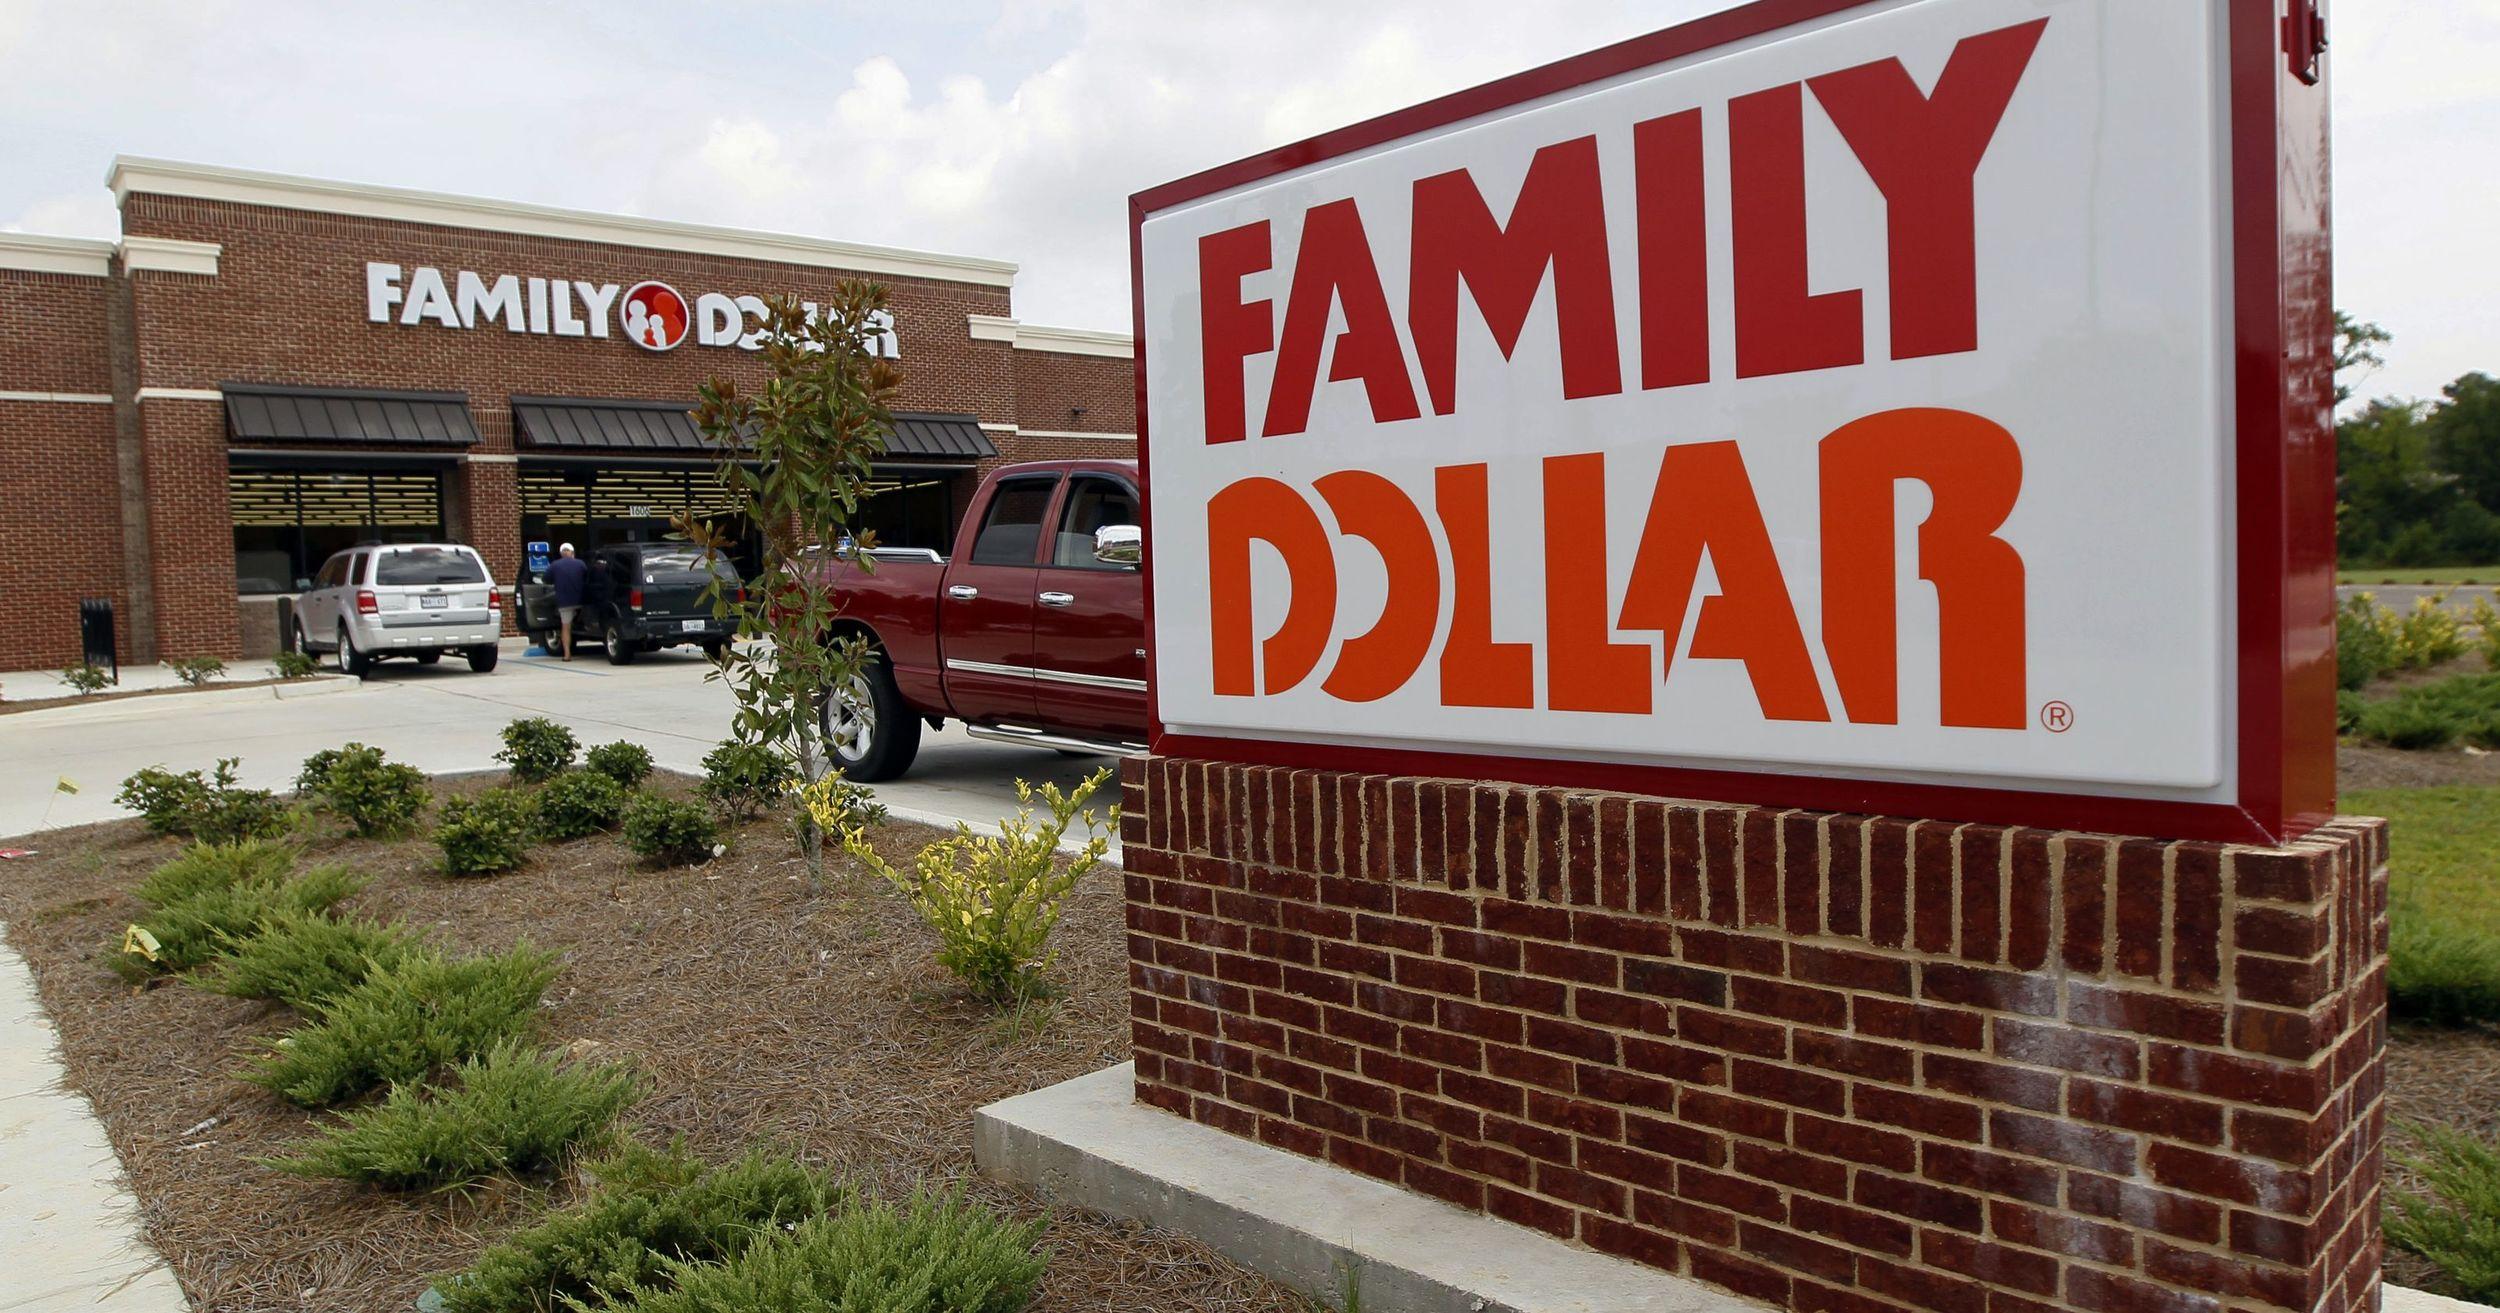 Family Dollar NNN Properties